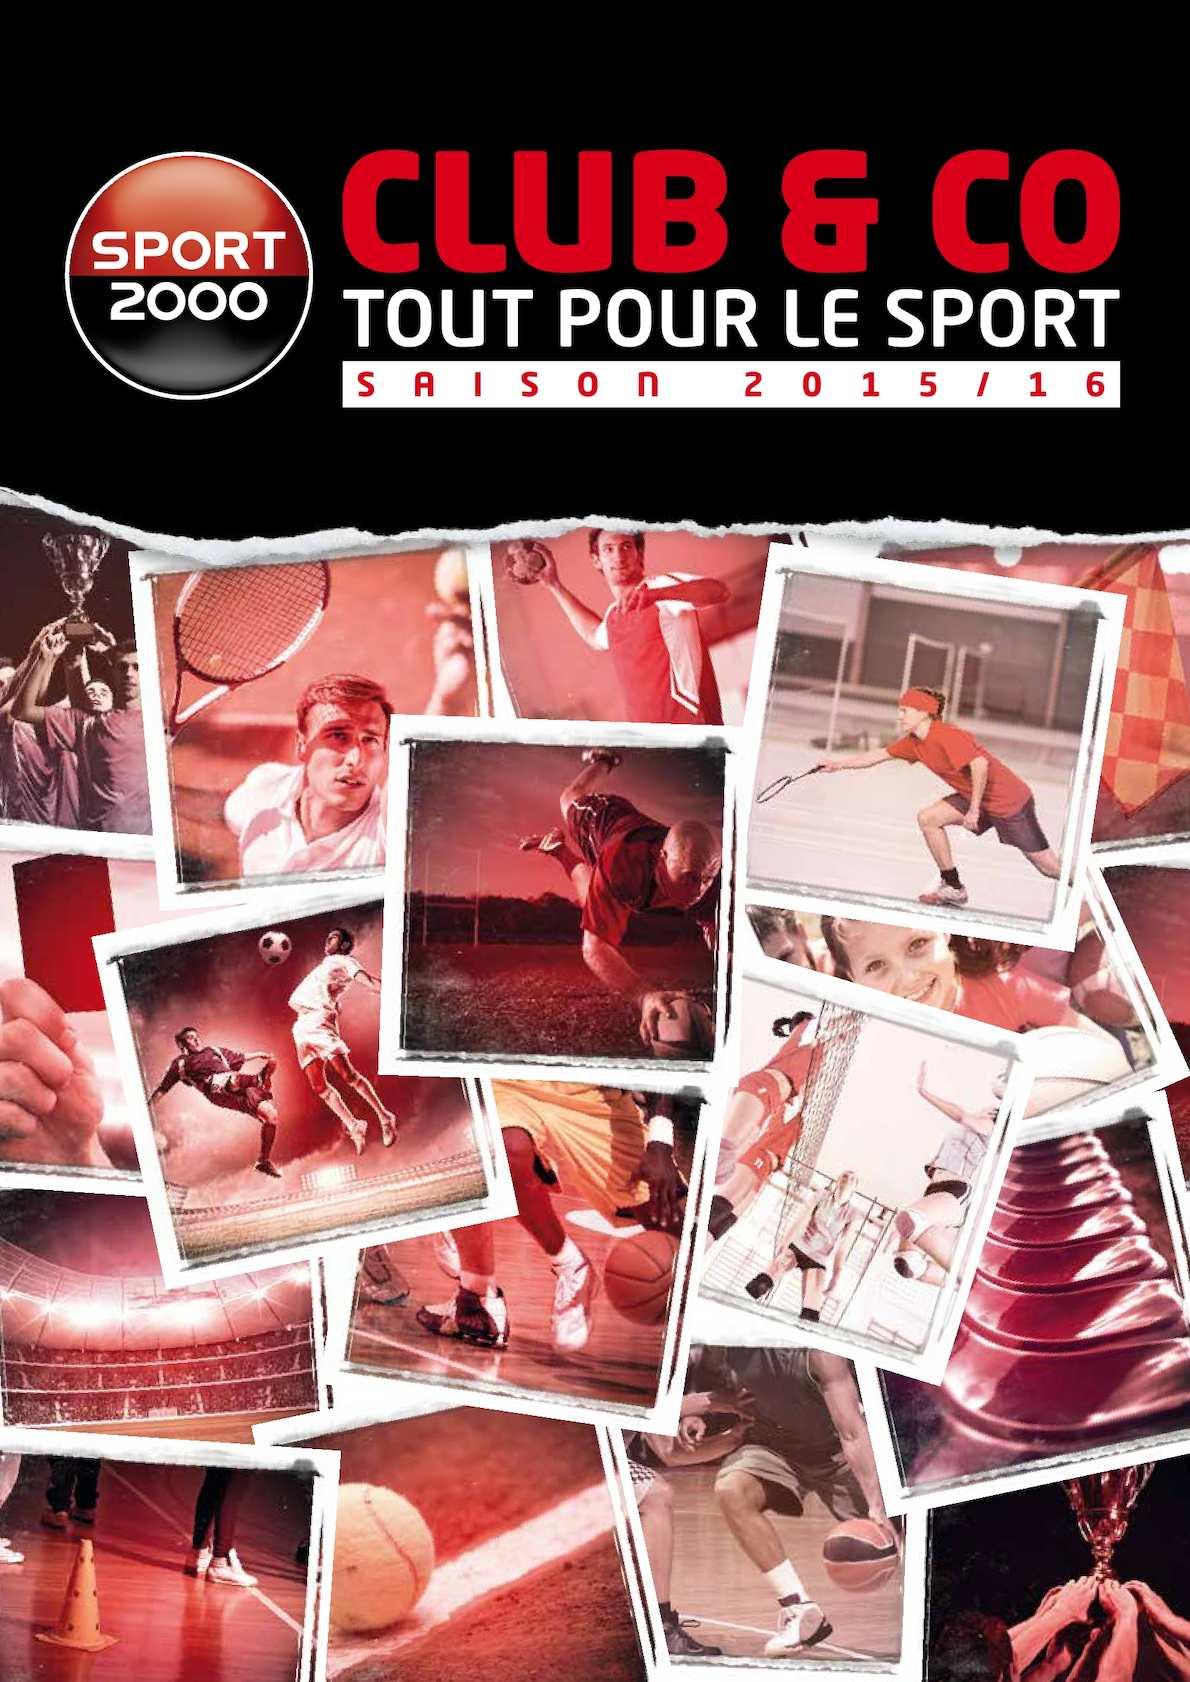 2015 2015 2015 SportCo Calaméo 2016 Catálogo SportCo Calaméo Calaméo Catálogo Catálogo SportCo 2016 OP08knw